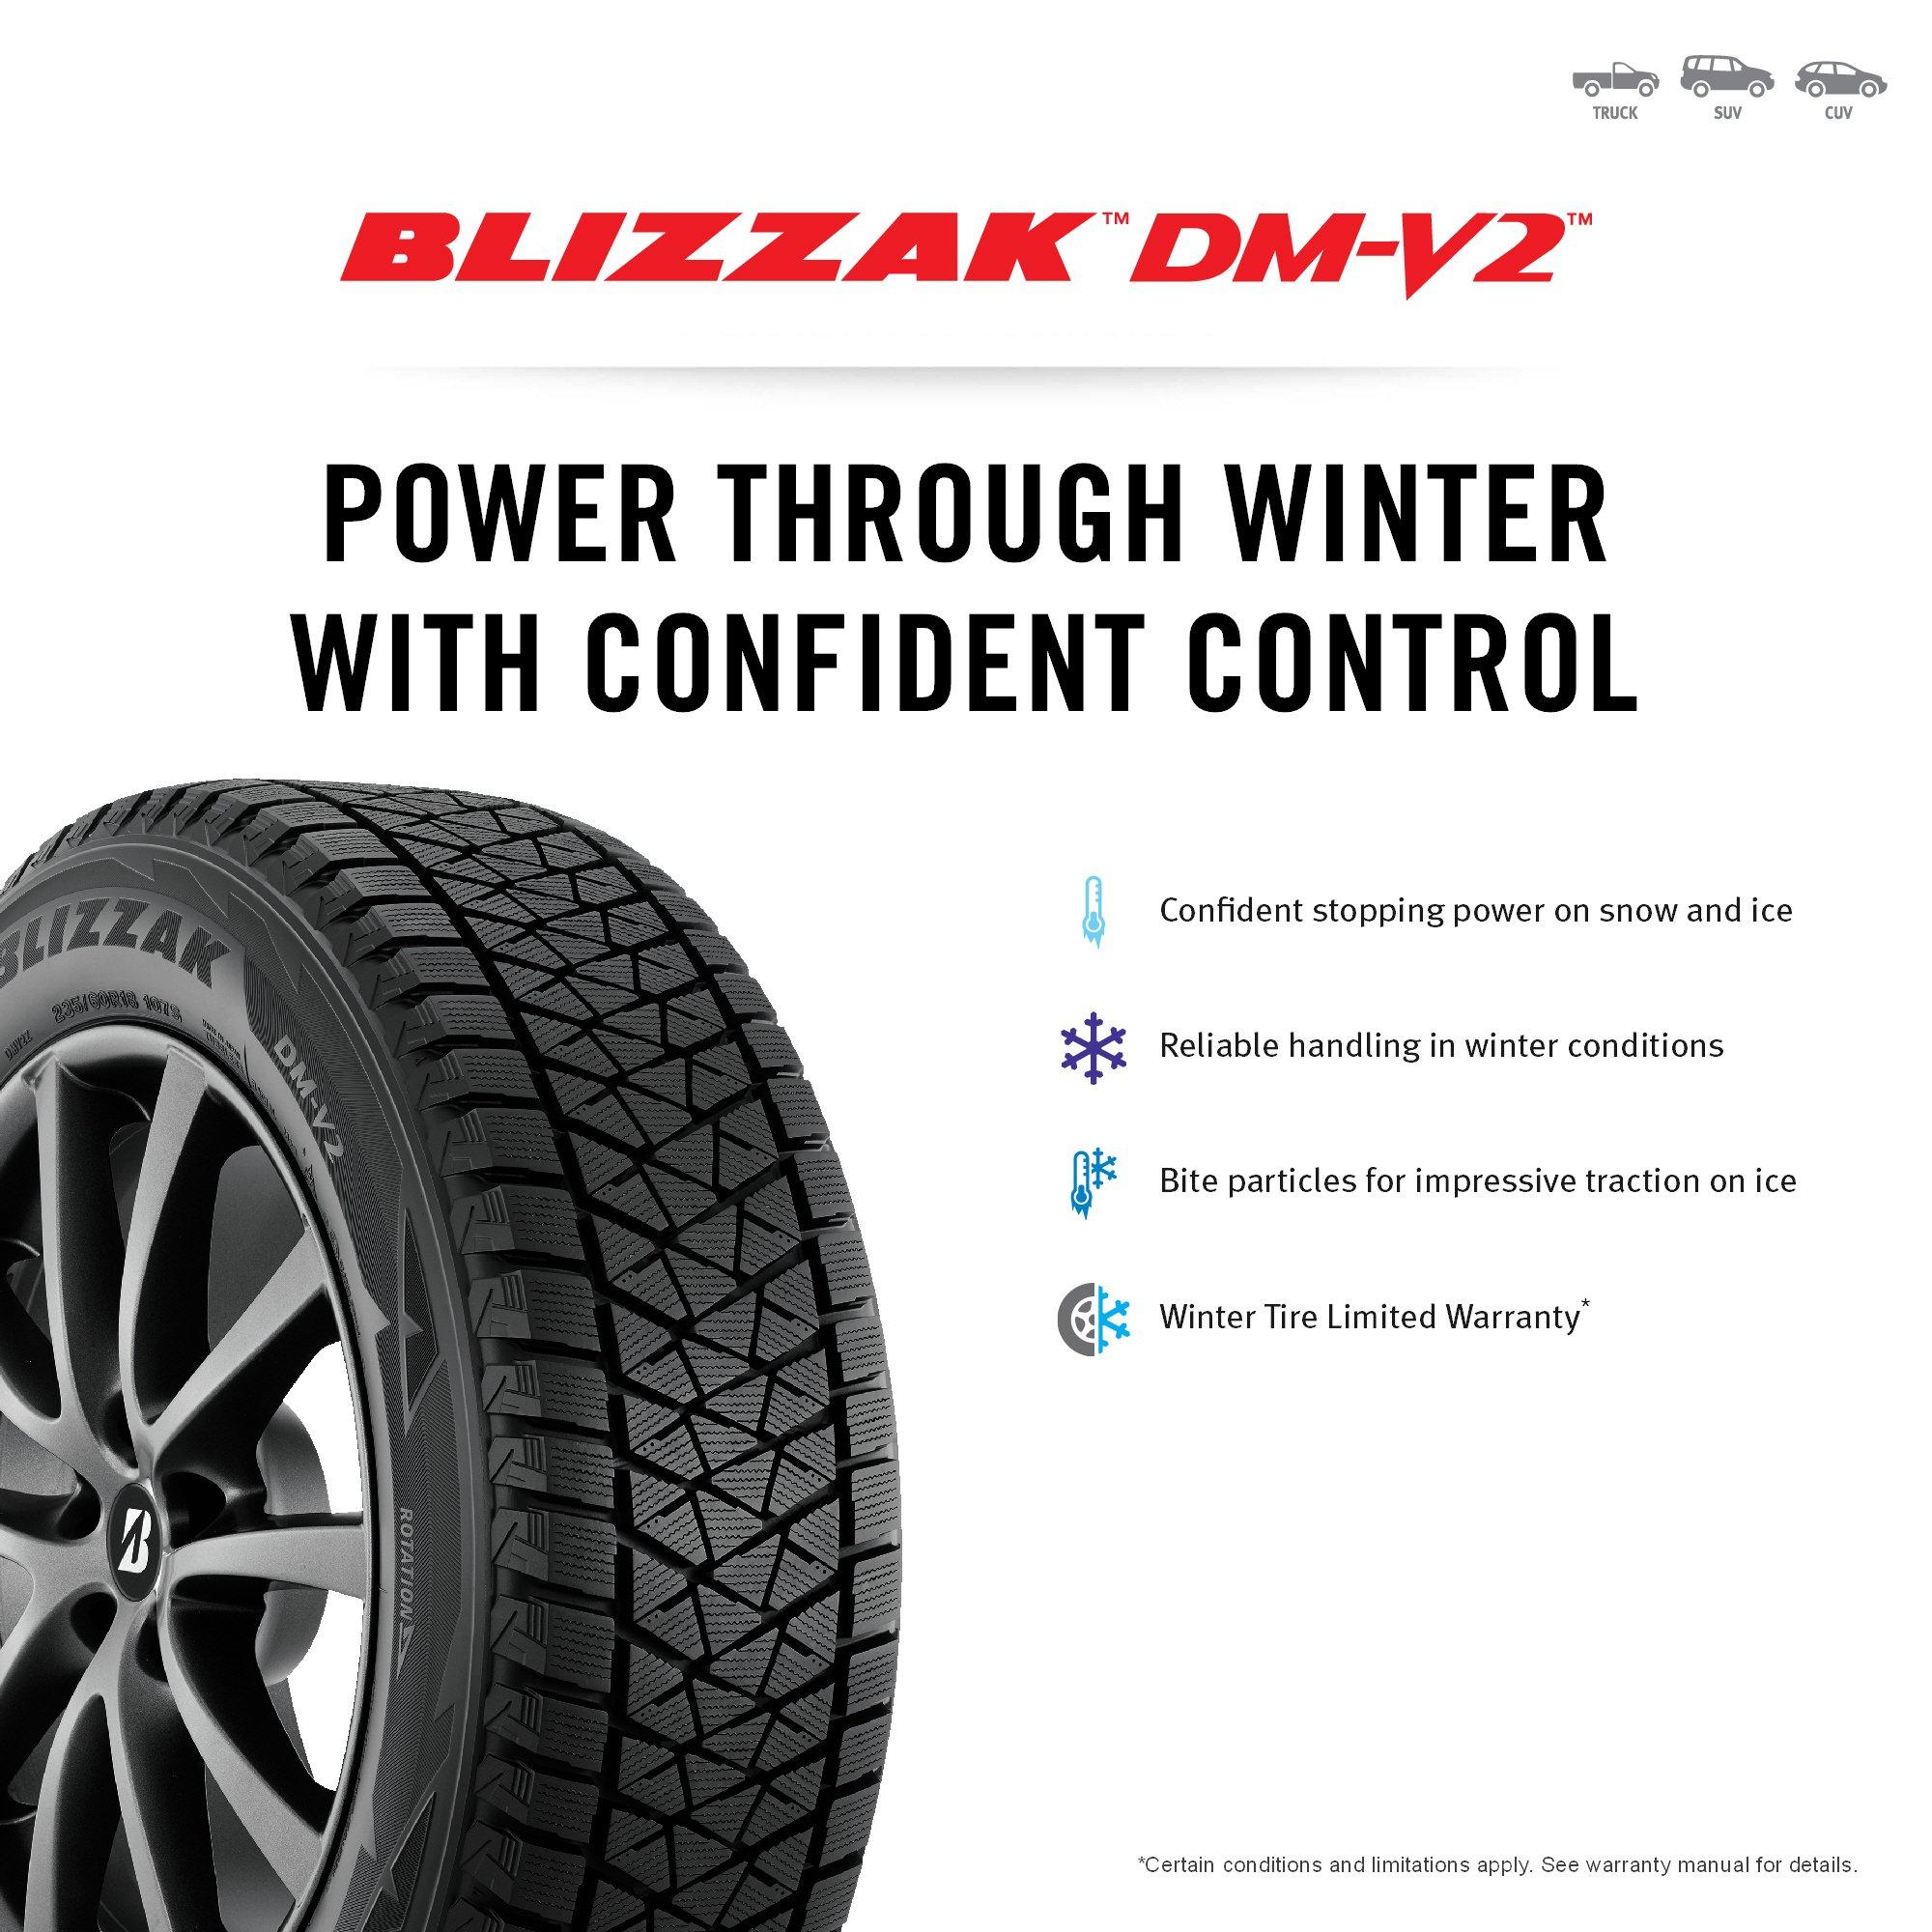 Bridgestone BLIZZAK DM-V2 Winter Radial Tire - 275/40R20 106T by Bridgestone (Image #3)